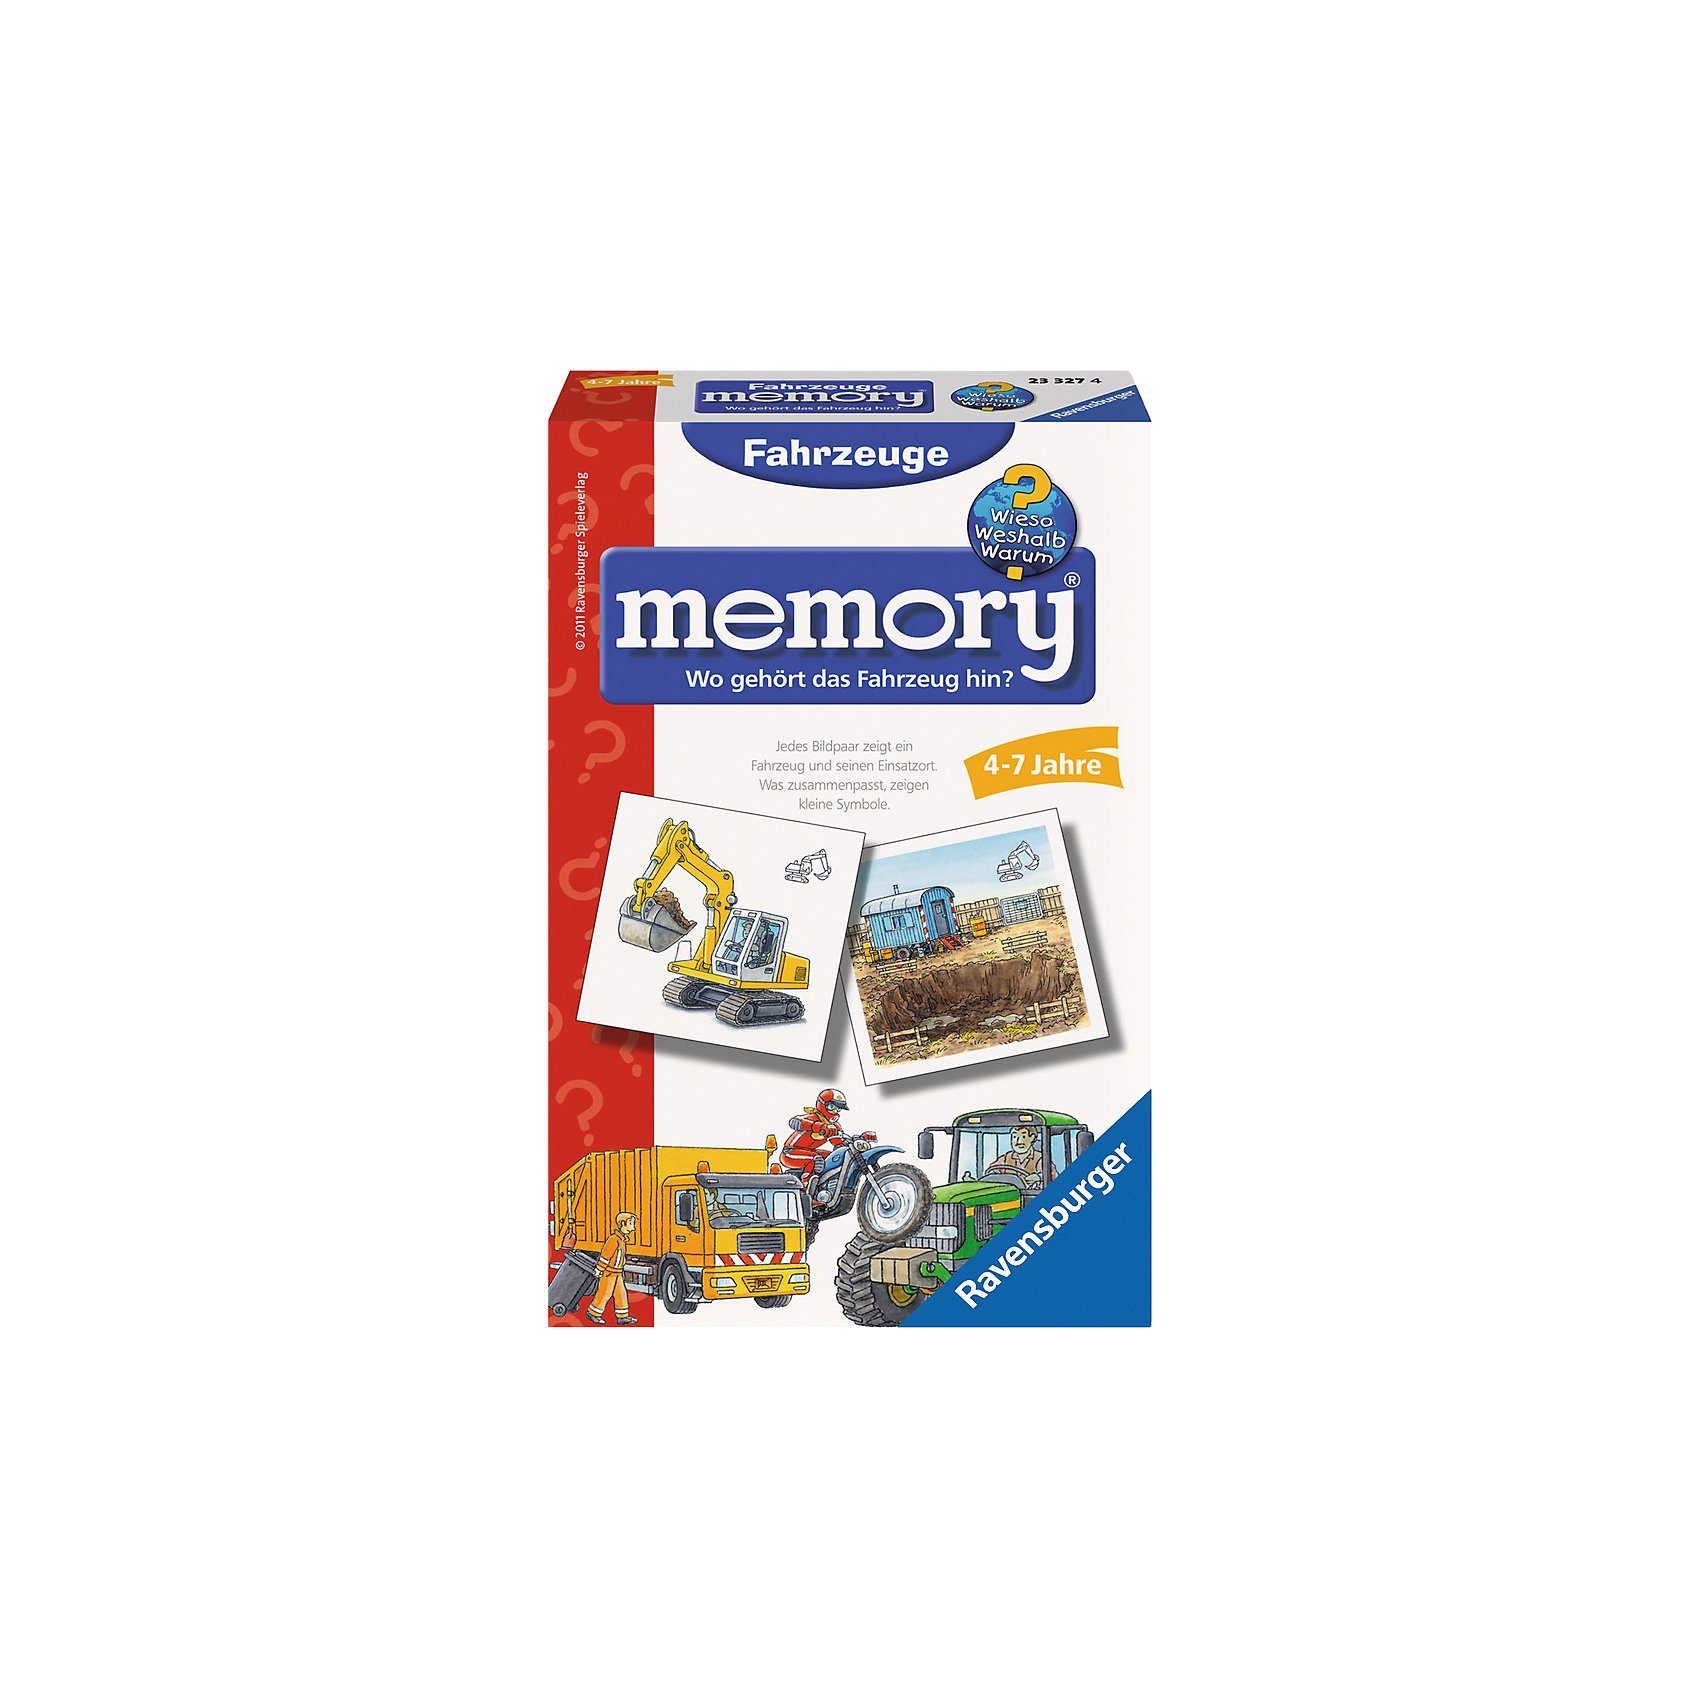 Ravensburger Mitbringspiel WWW: Fahrzeuge memory®